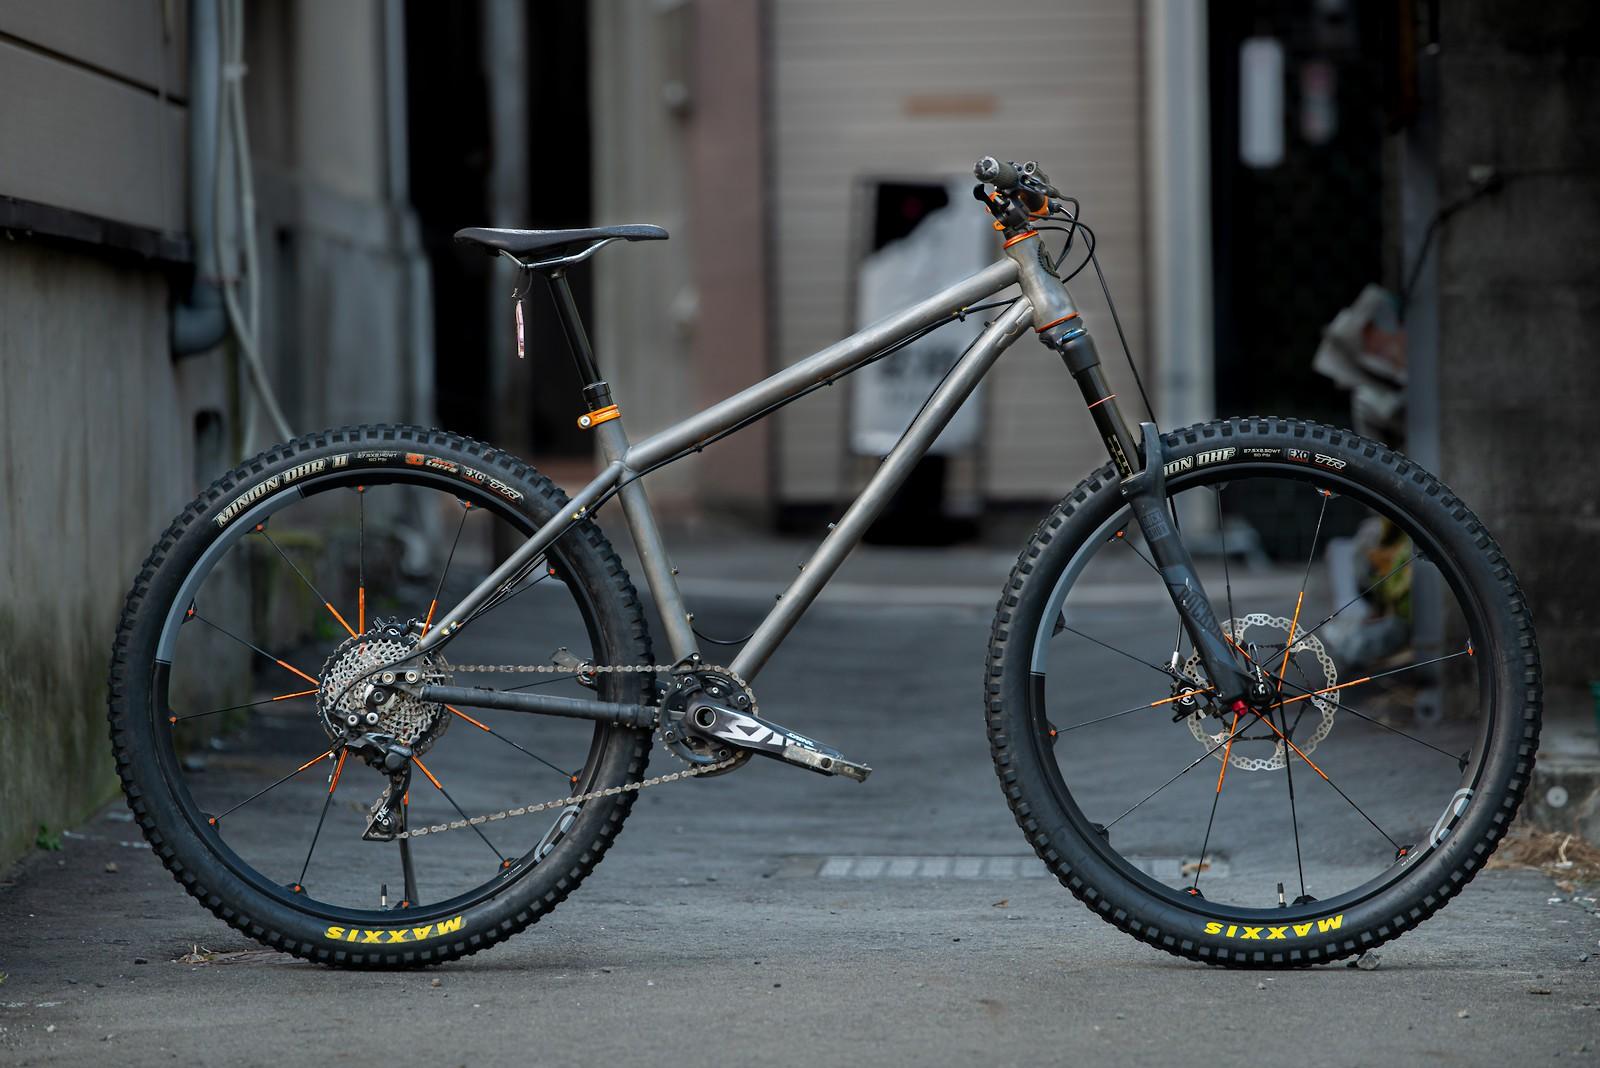 Kona Explosif - Vital Bike of the Day December 2020 - Mountain Biking Pictures - Vital MTB